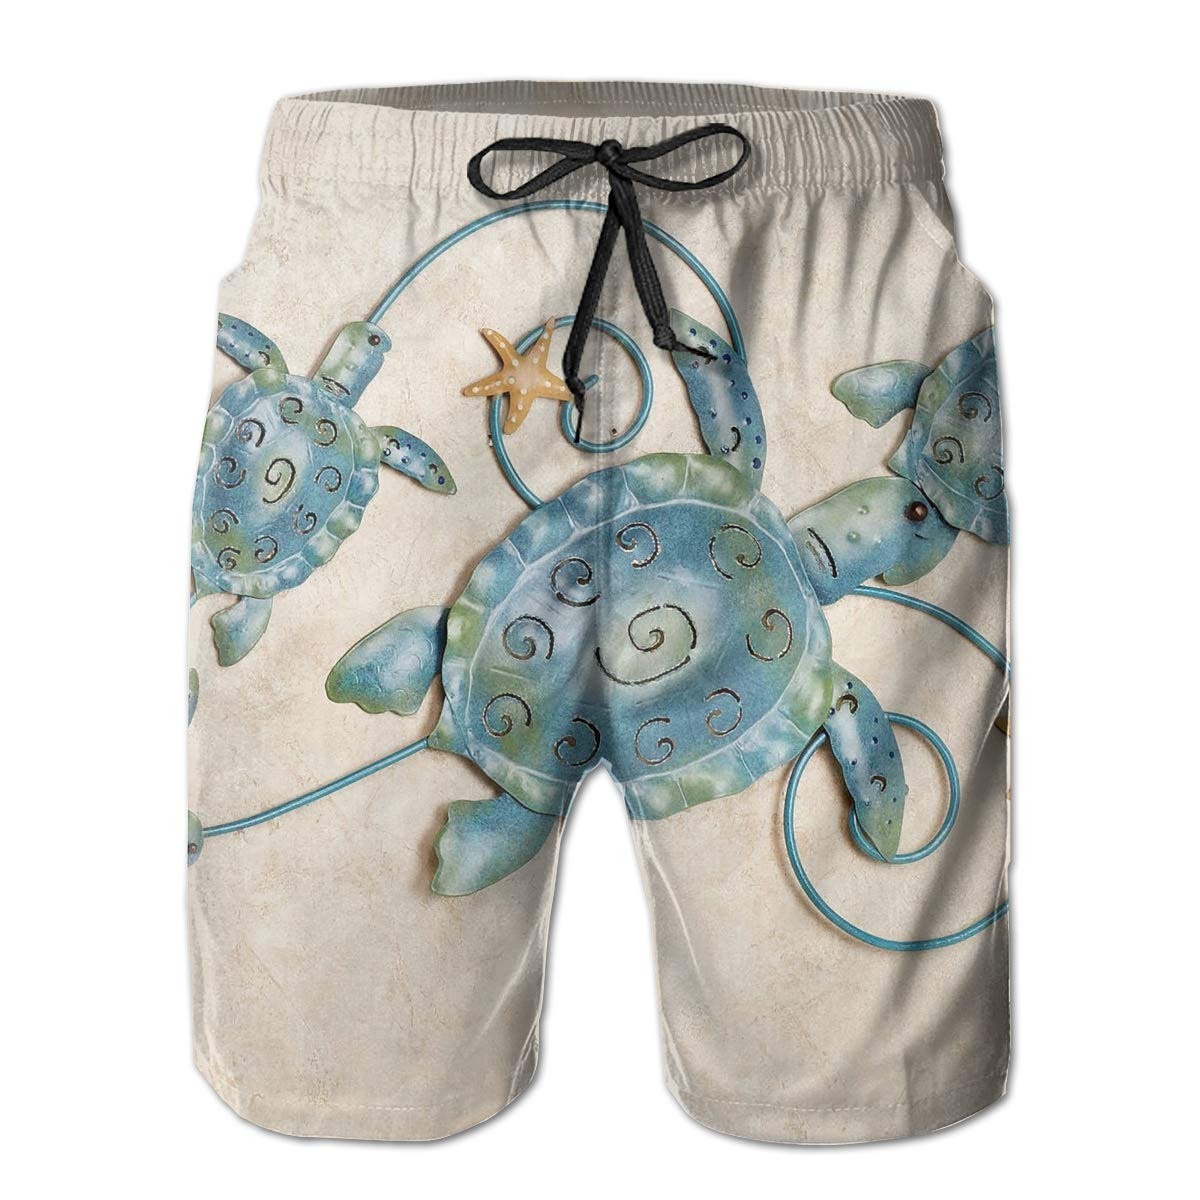 Sea Turtle Metal Regarding Ocean Friends Sea Turtle Mens Swim Trunks Board Beachwear Casual Beach Shorts for Men